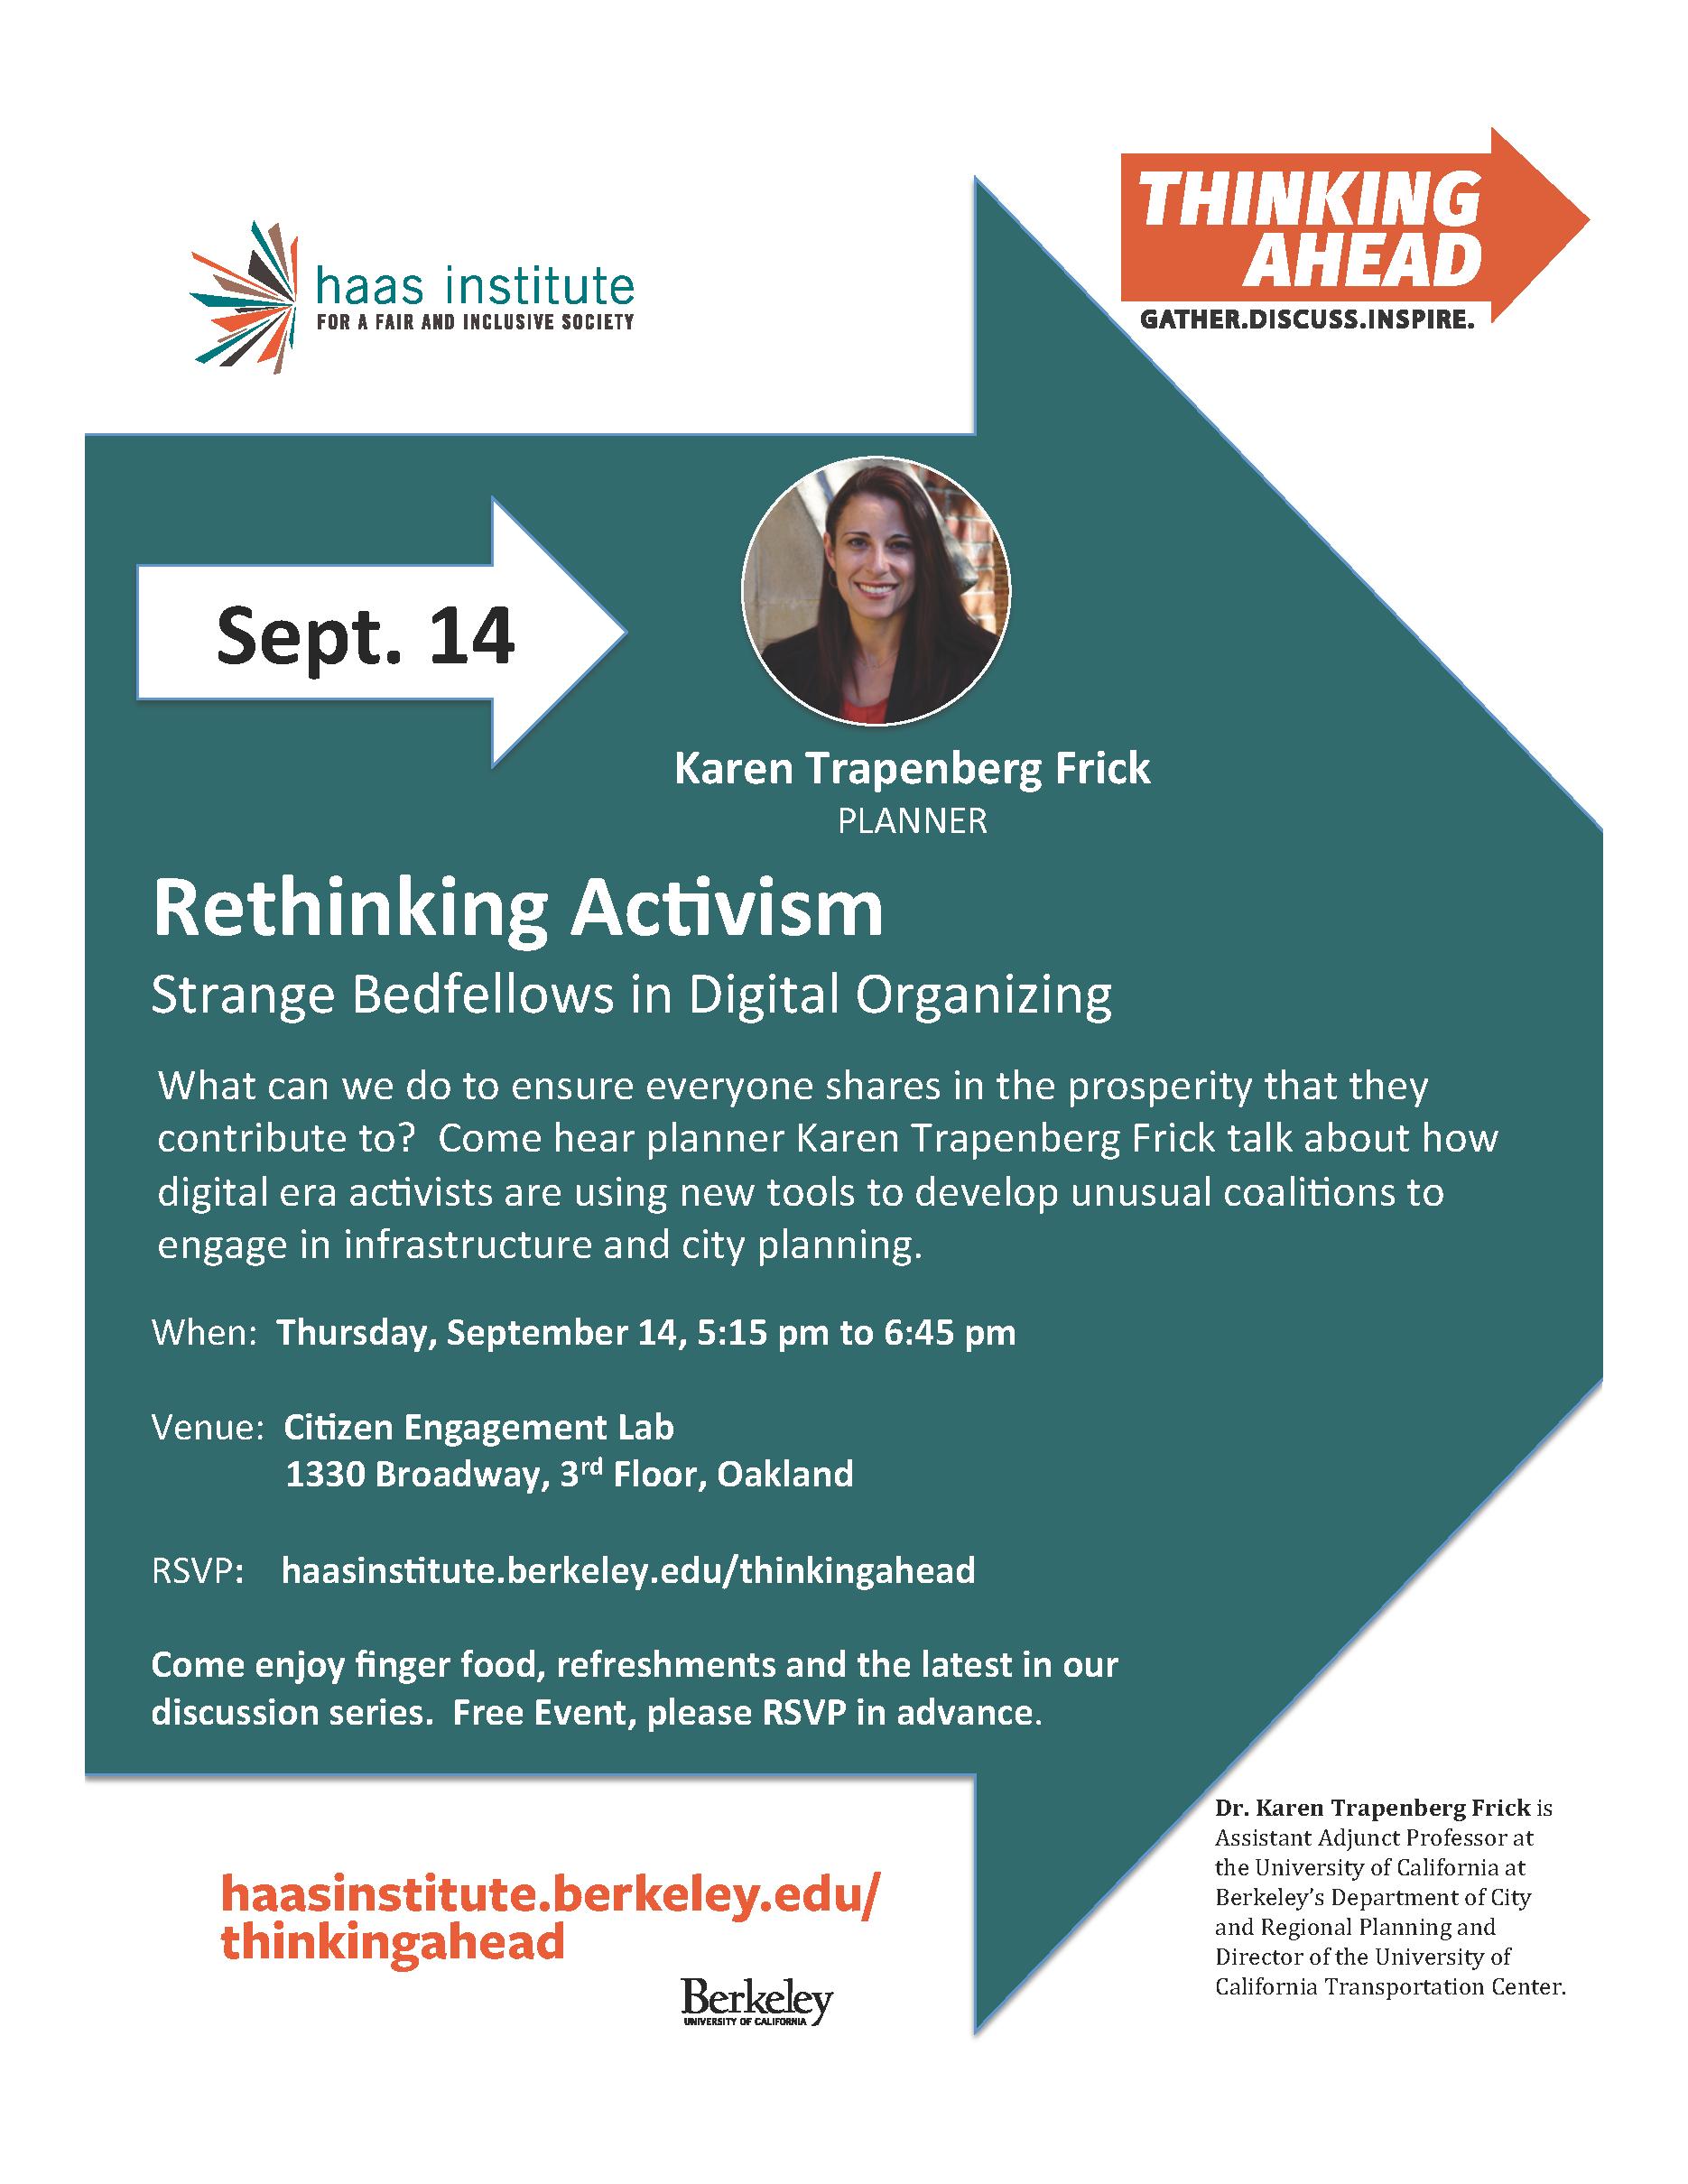 Rethinking Activism flyer